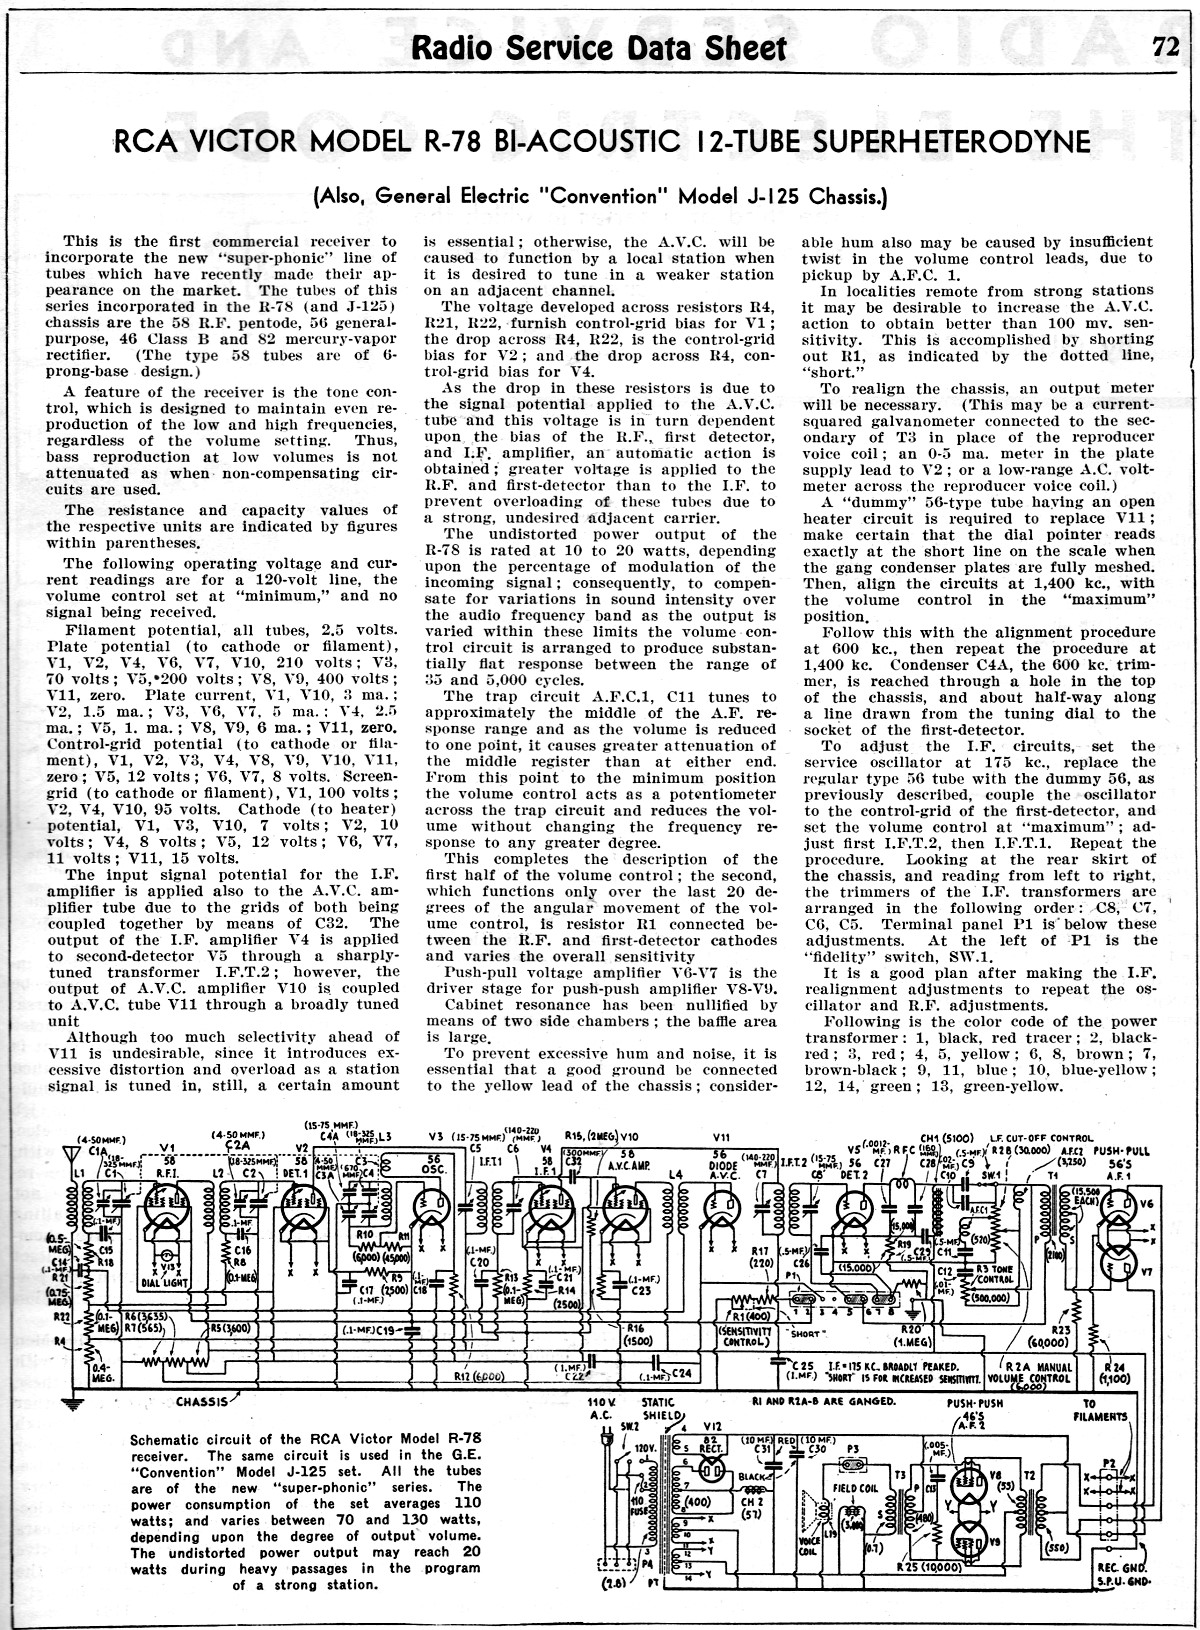 RCA Victor Model R-78 B1-Acoustic 12-Tube Superheterodyne